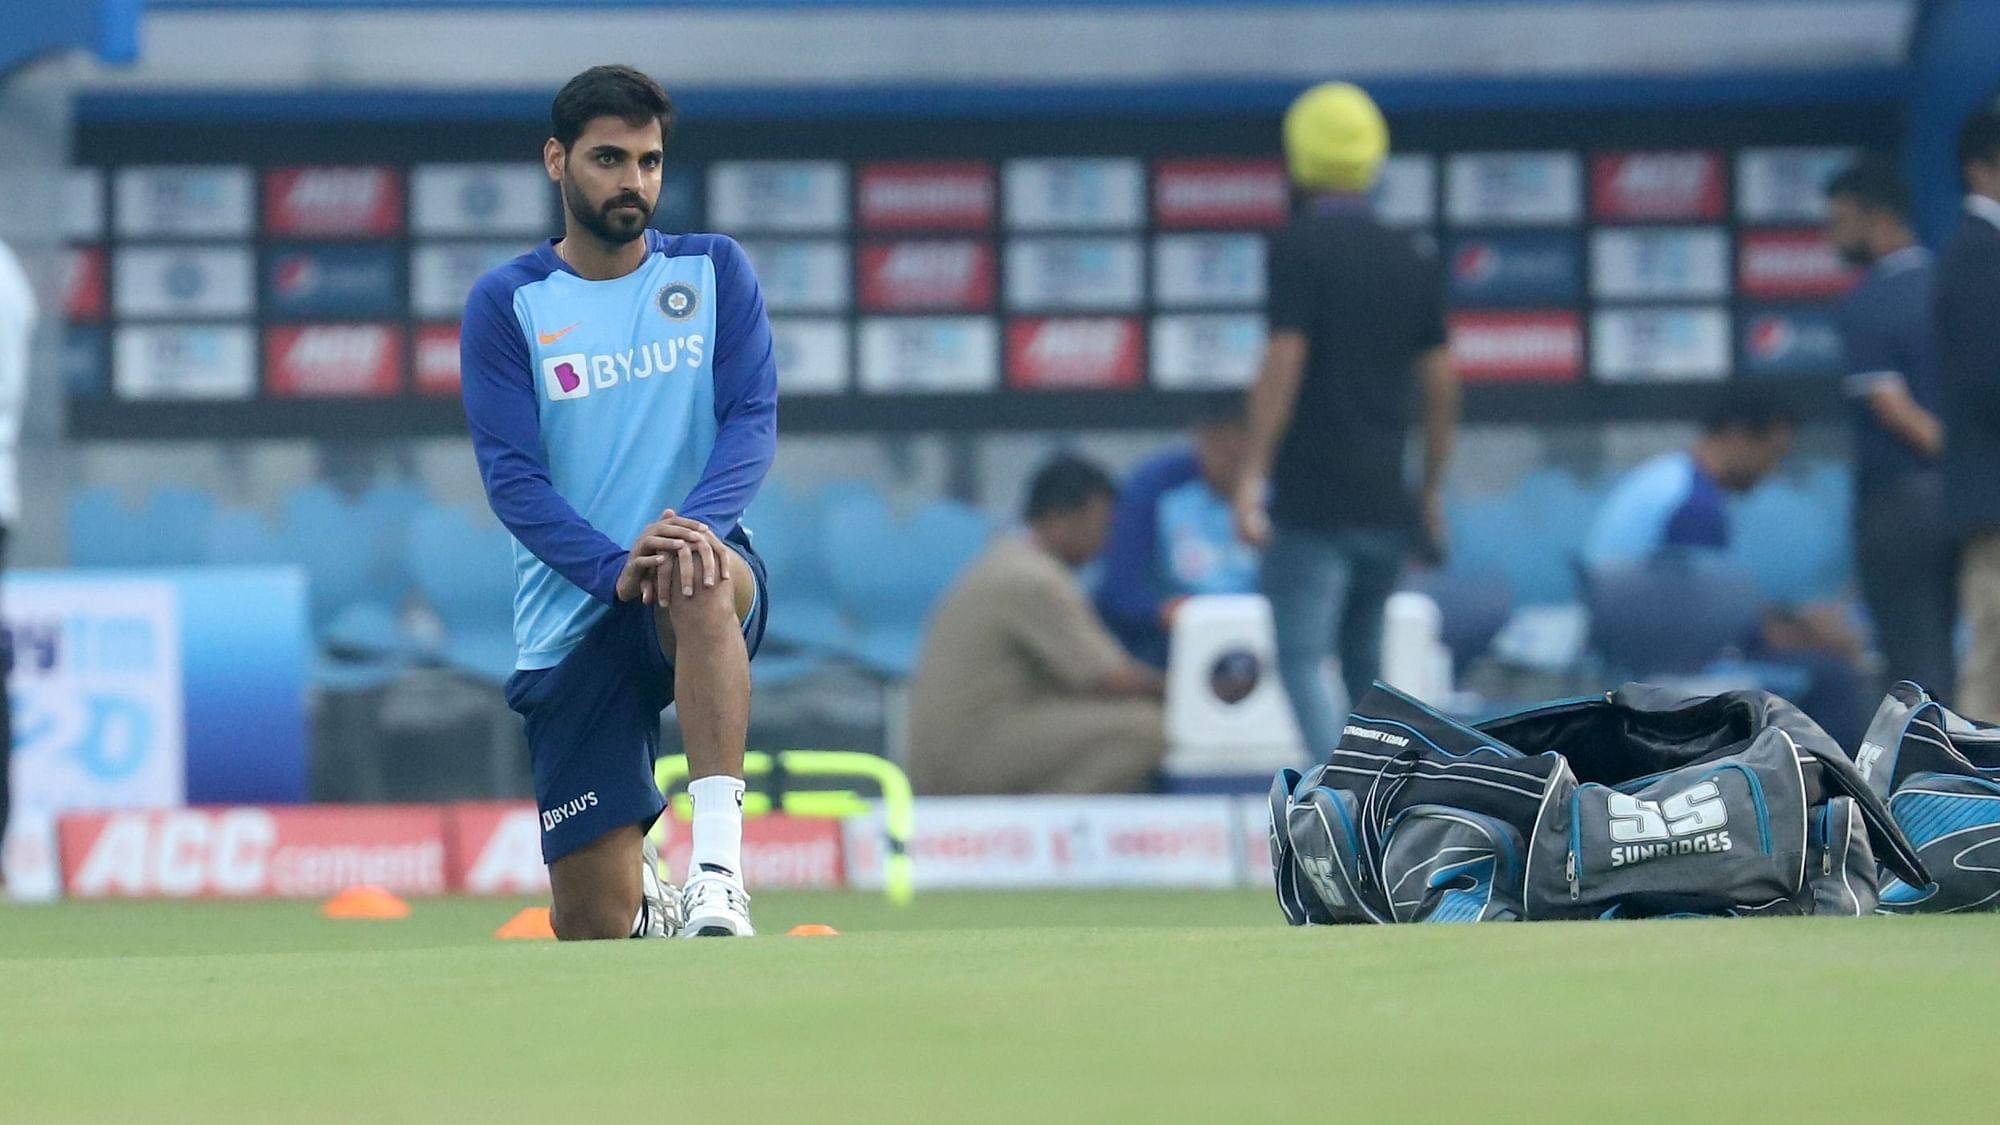 India vs West Indies ODI's: Injured Bhuvneshwar Kumar Ruled Out